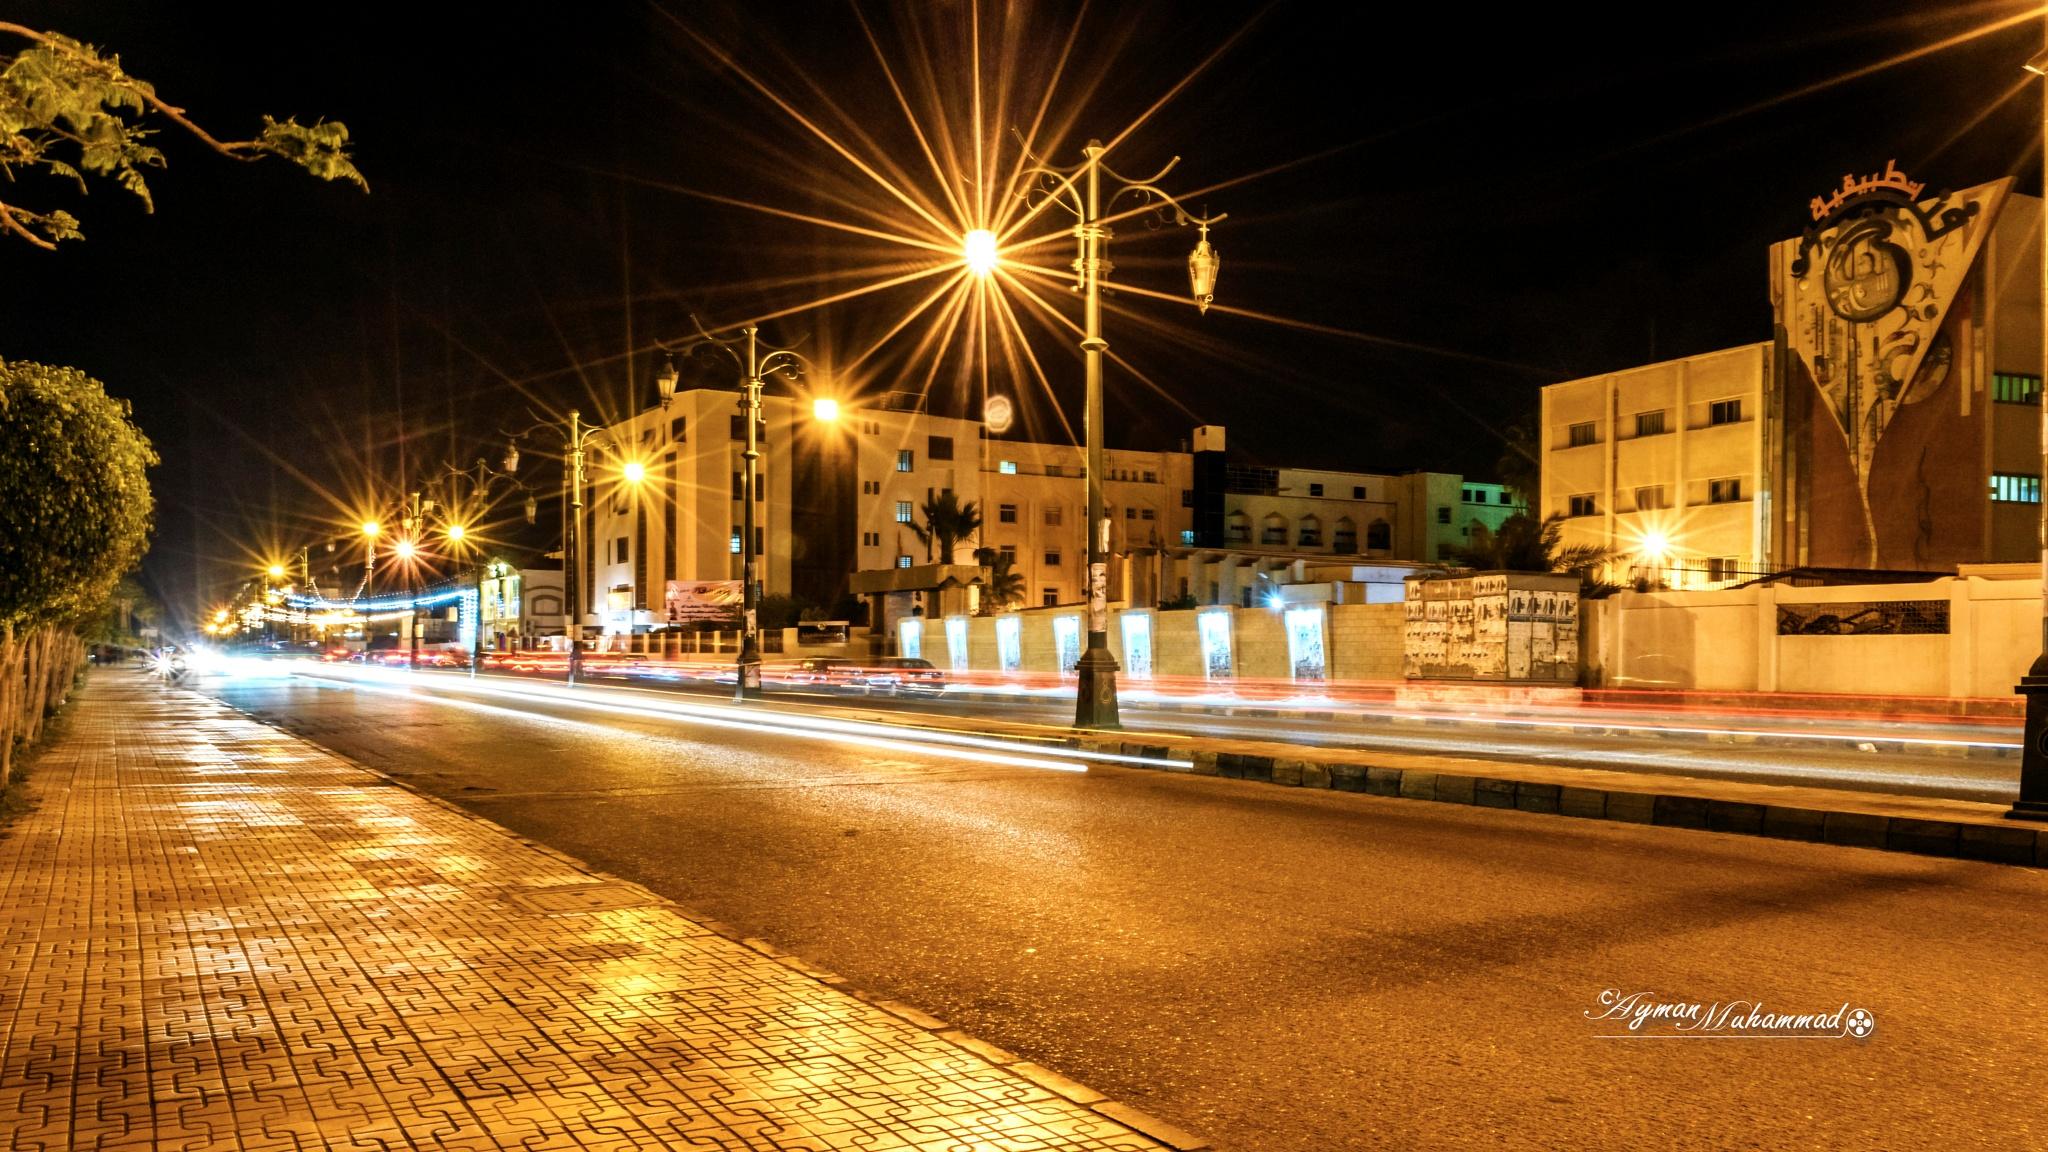 Streets of Damietta city at night +1 by AymanMuhammad